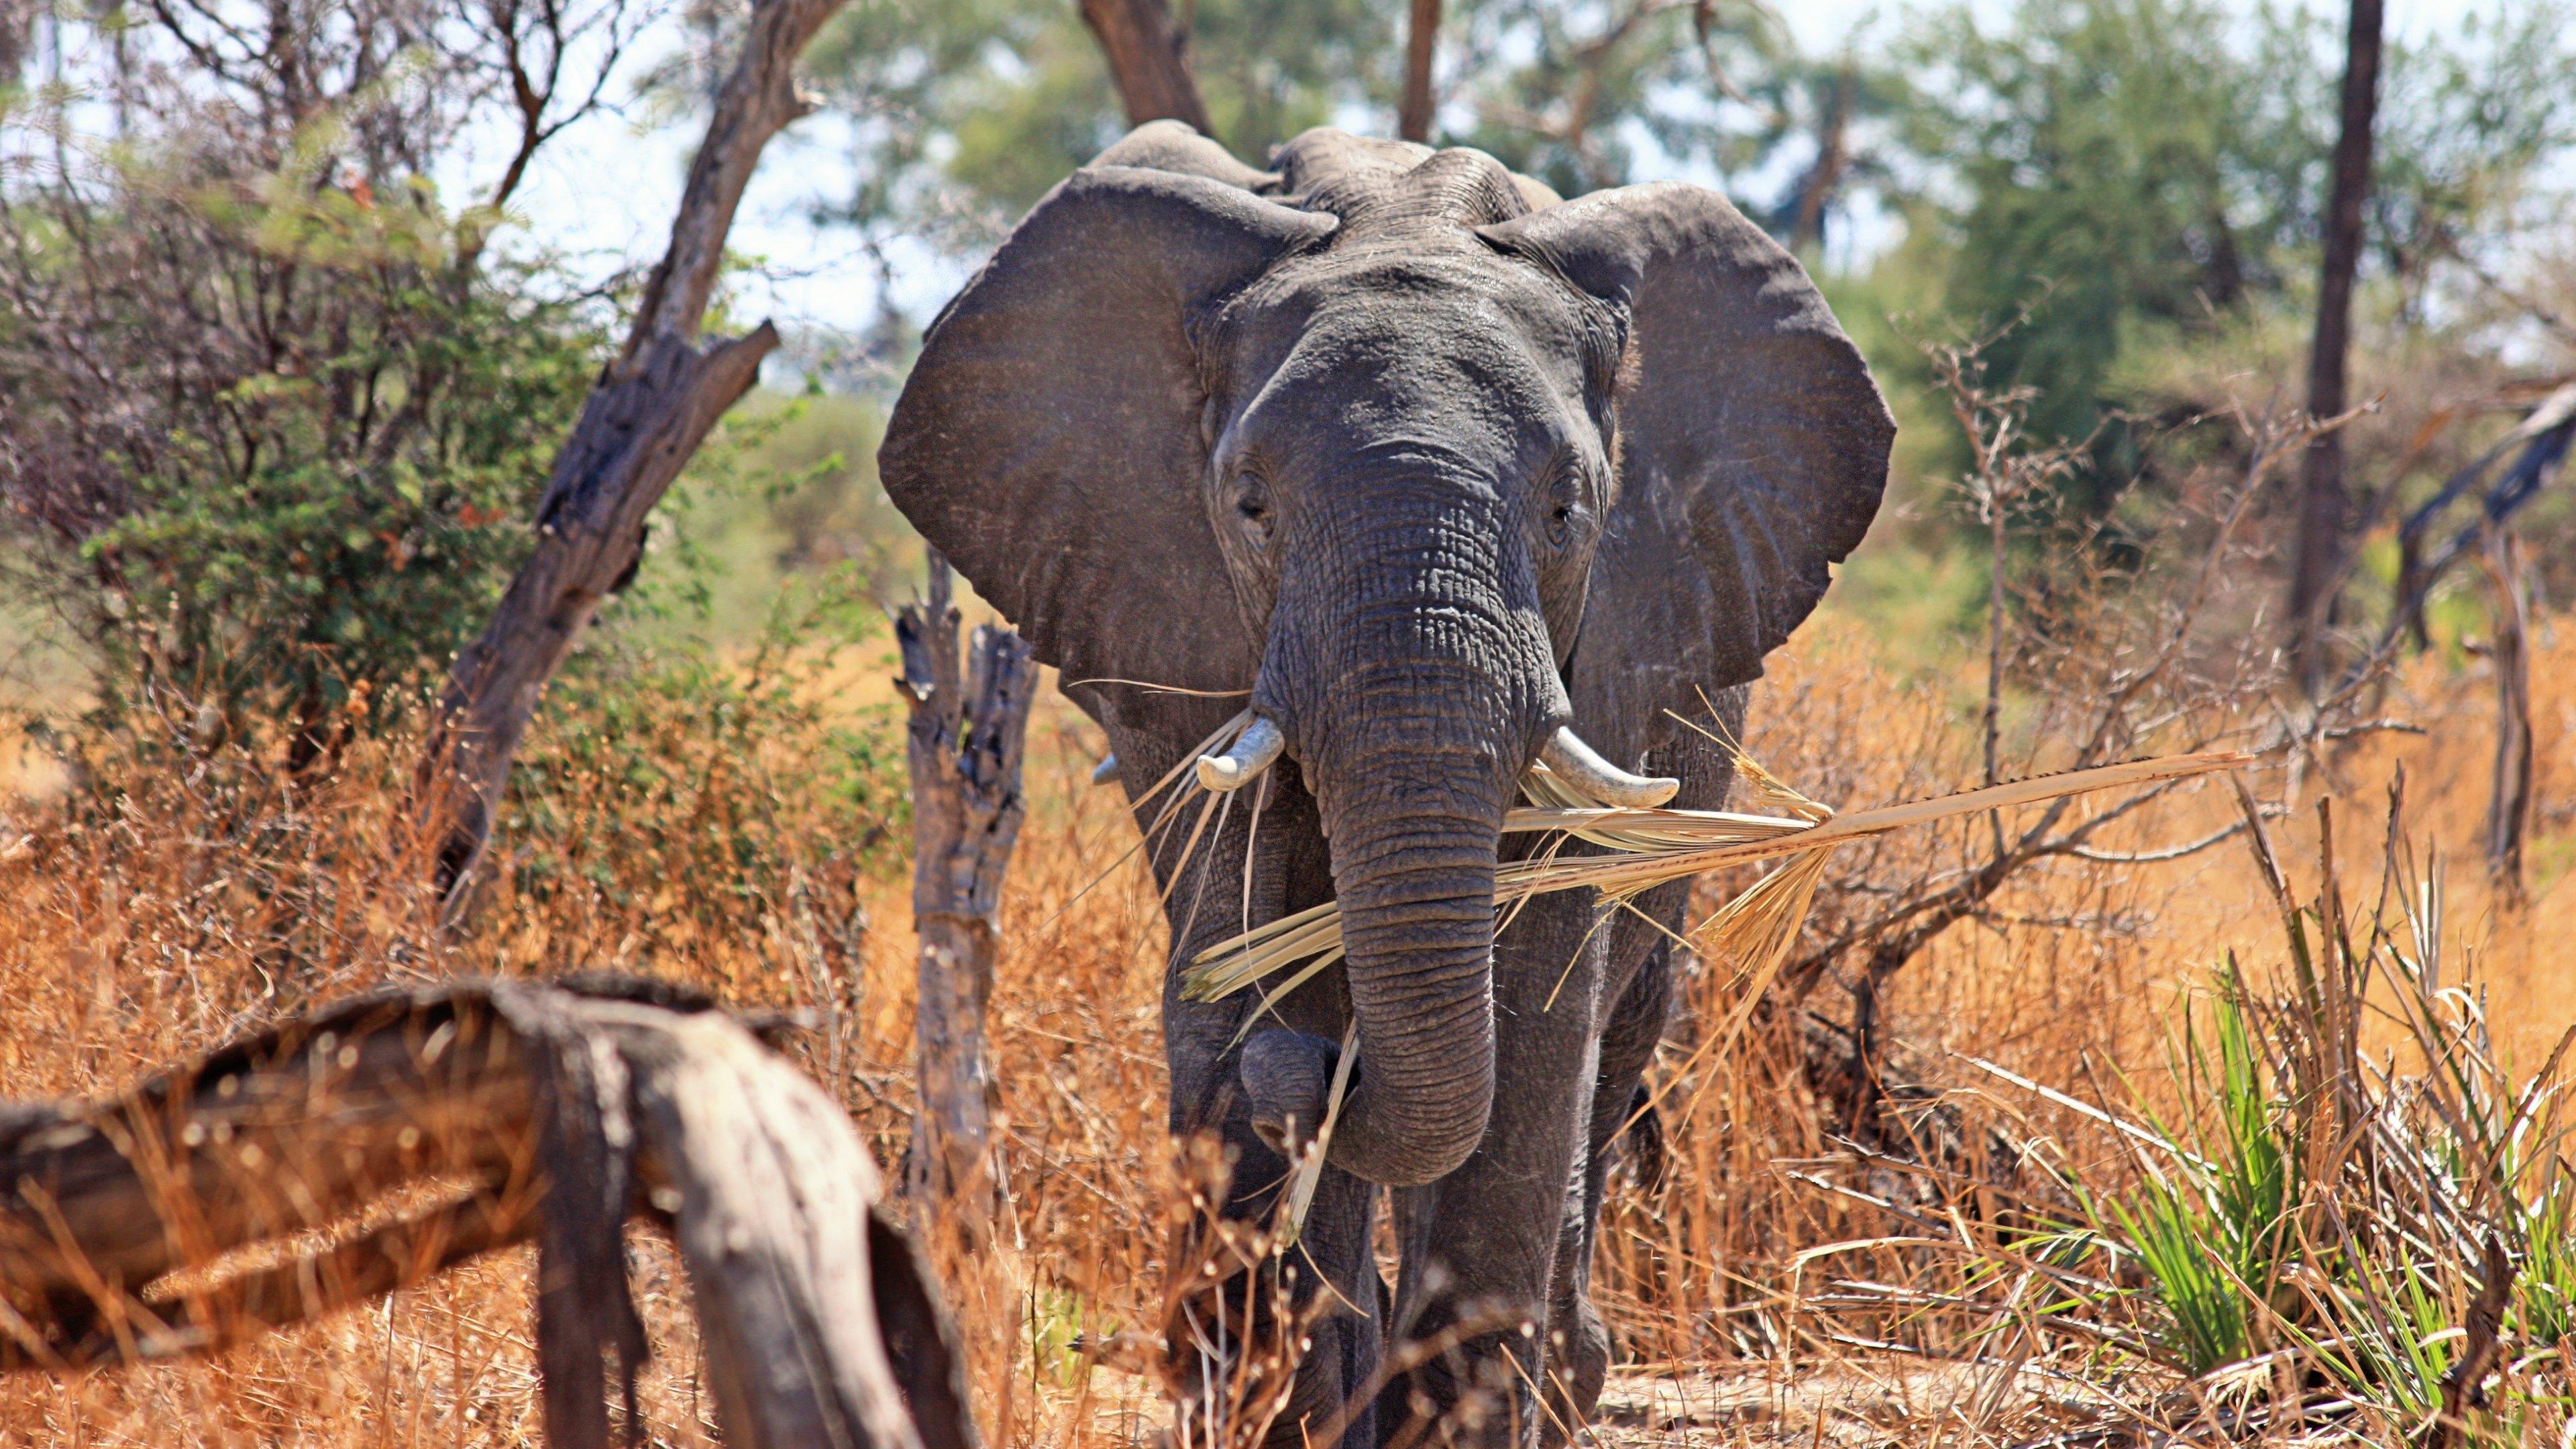 Elephant, african, safari, animal, elephant, African savanna, strength